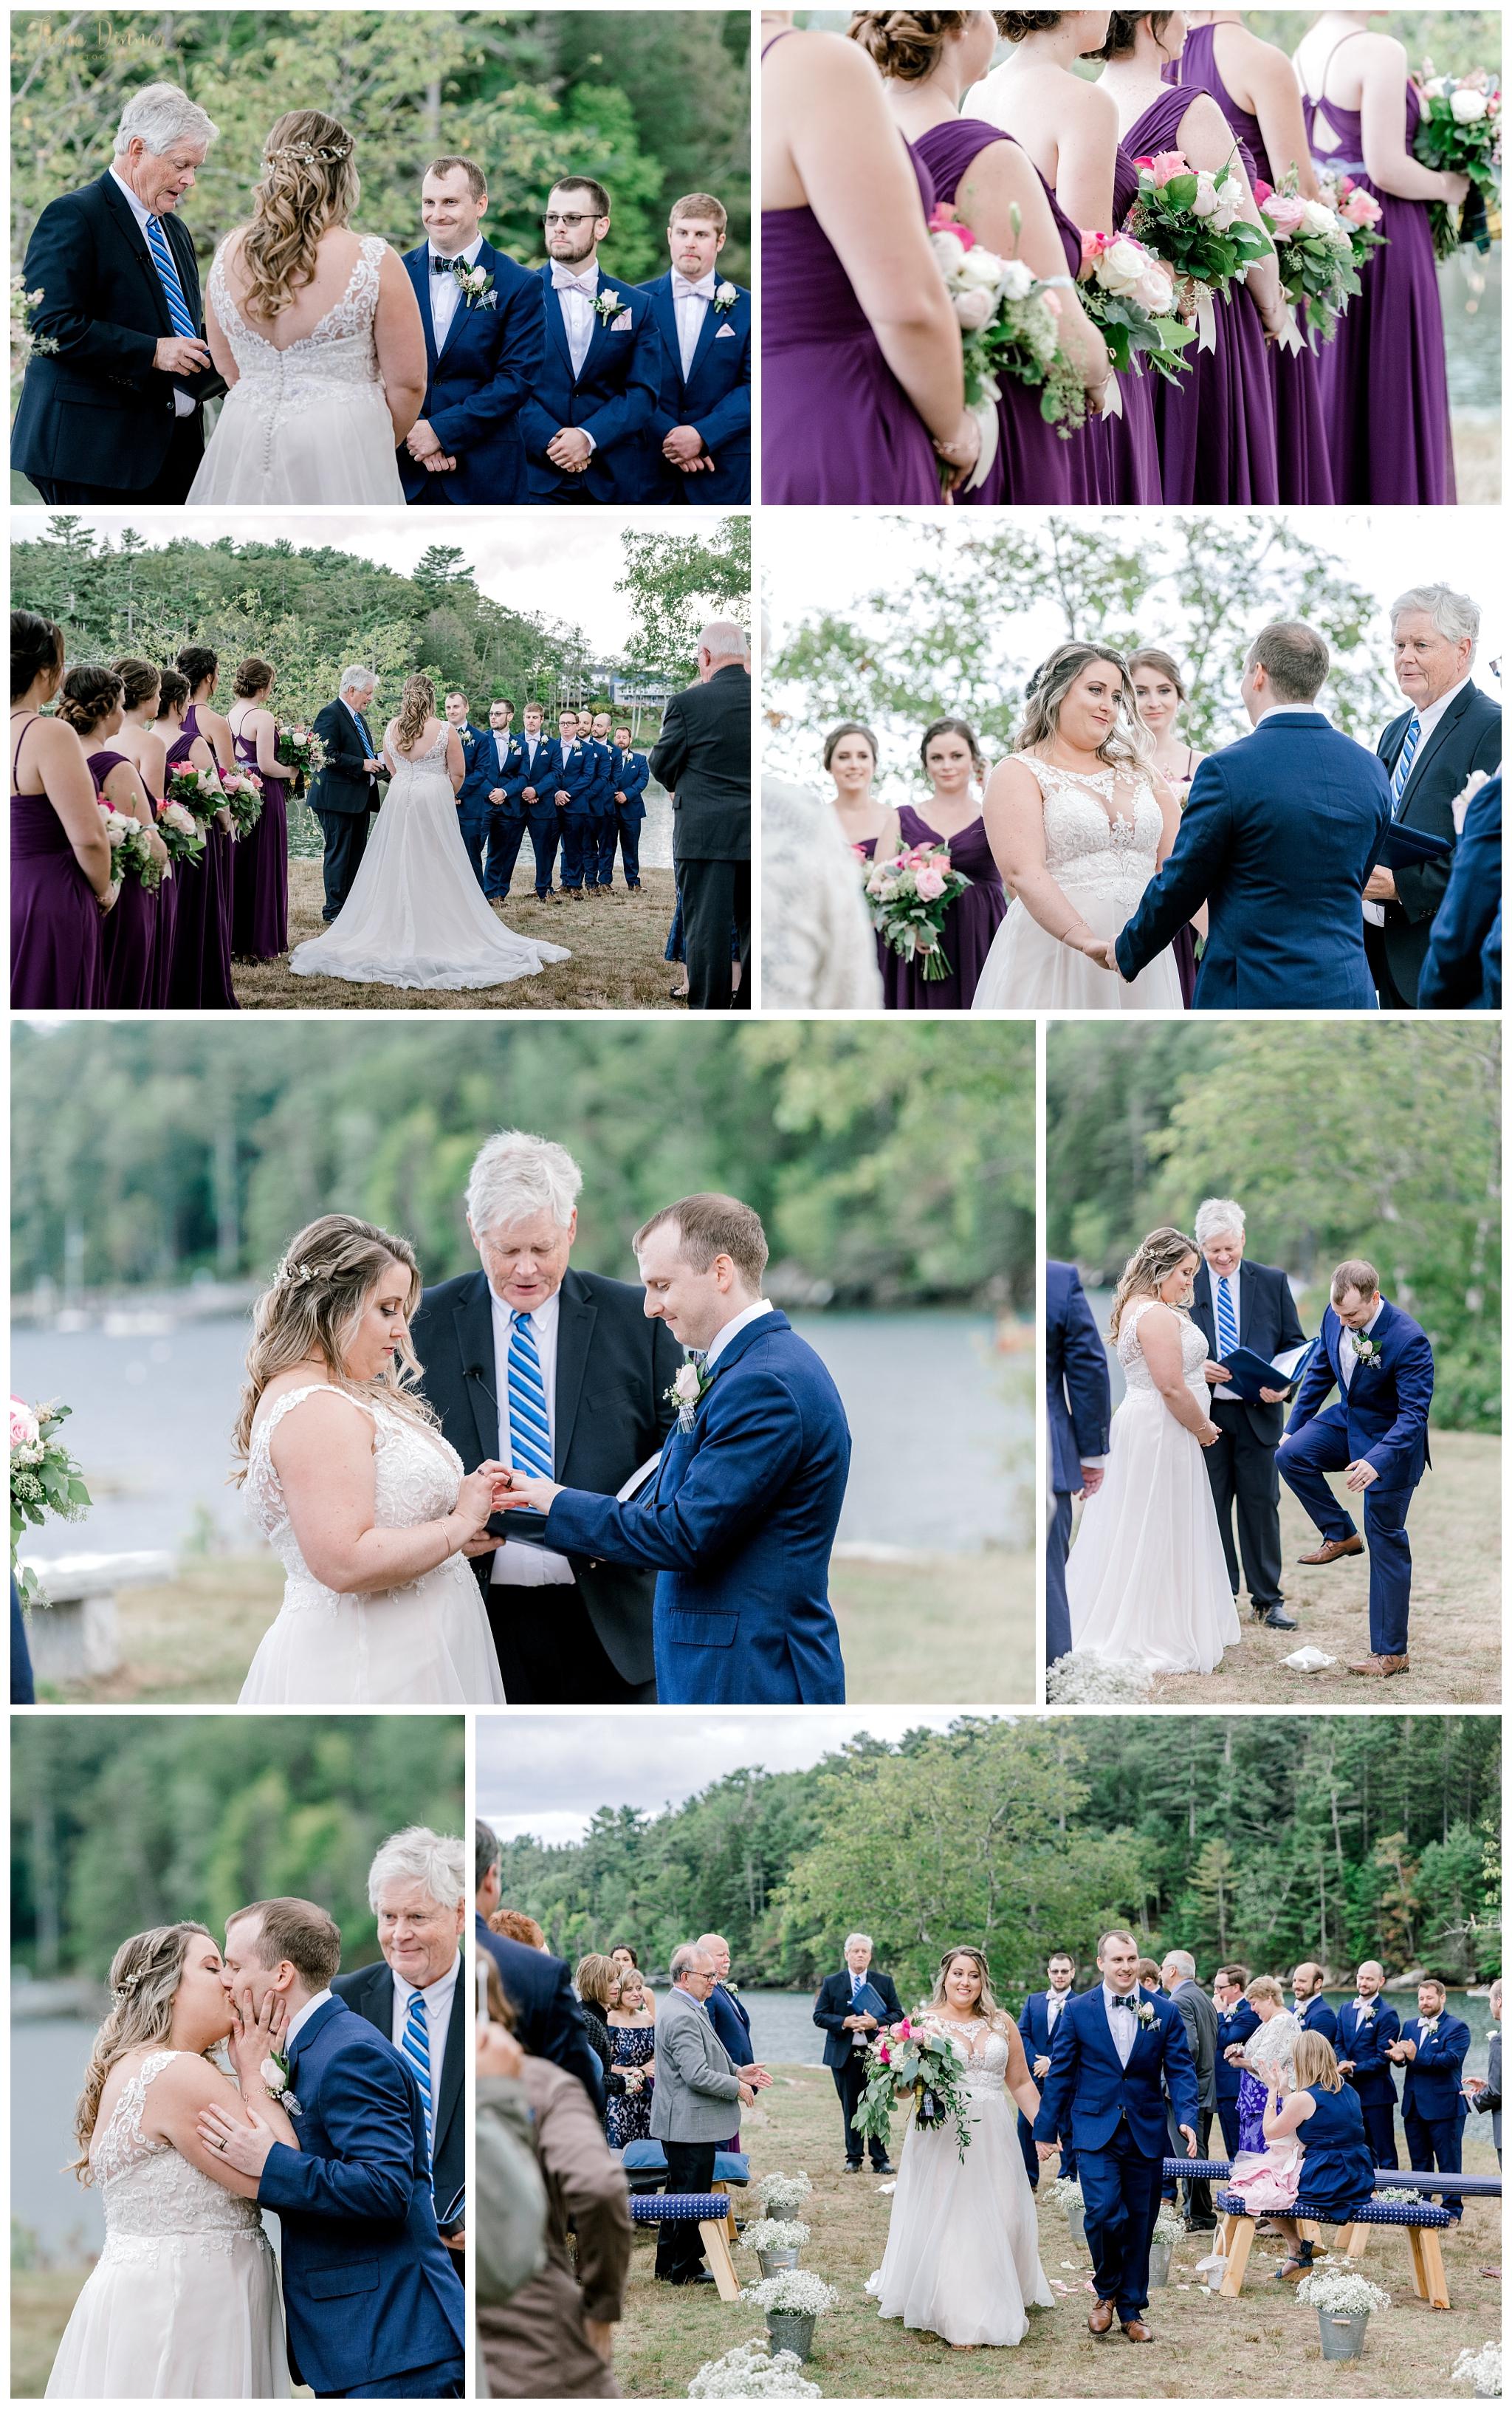 Barrett Park Boothbay Harbor Wedding Ceremony